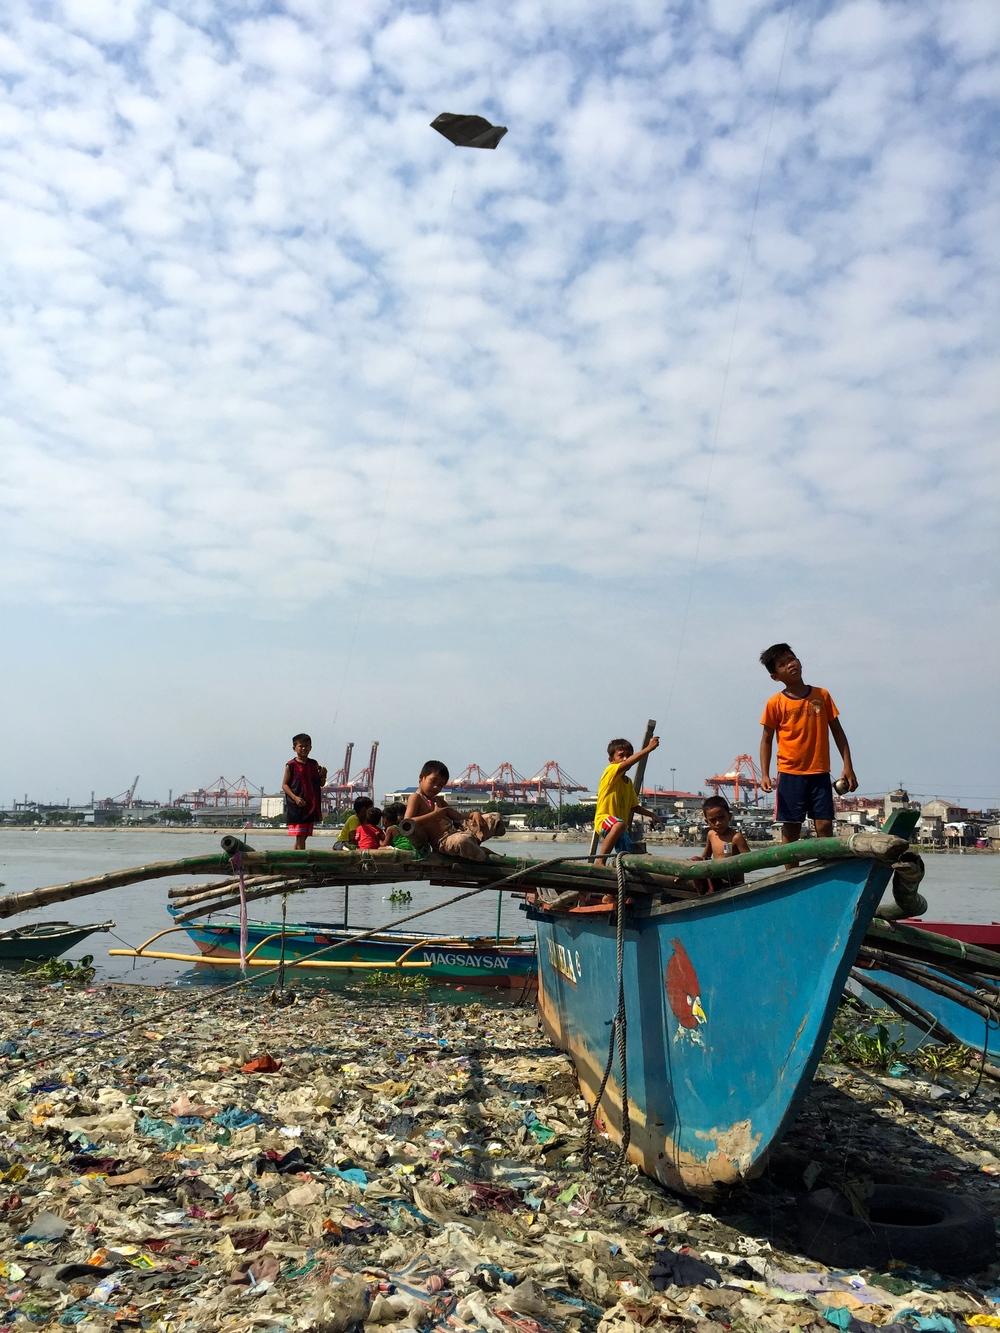 Baseco playtime on a bangka (boat)